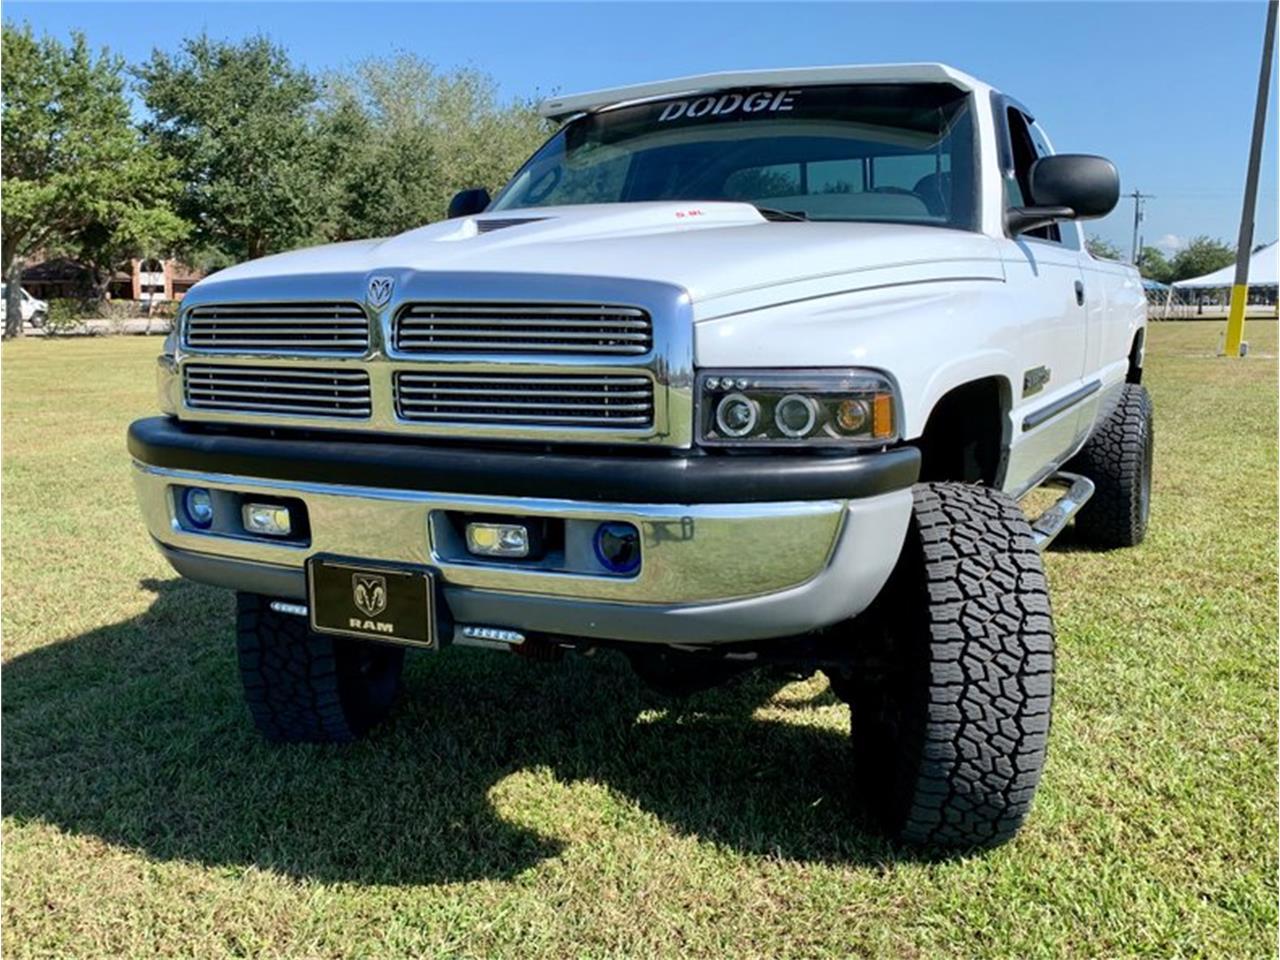 2001 Dodge Ram (CC-1413318) for sale in Punta Gorda, Florida